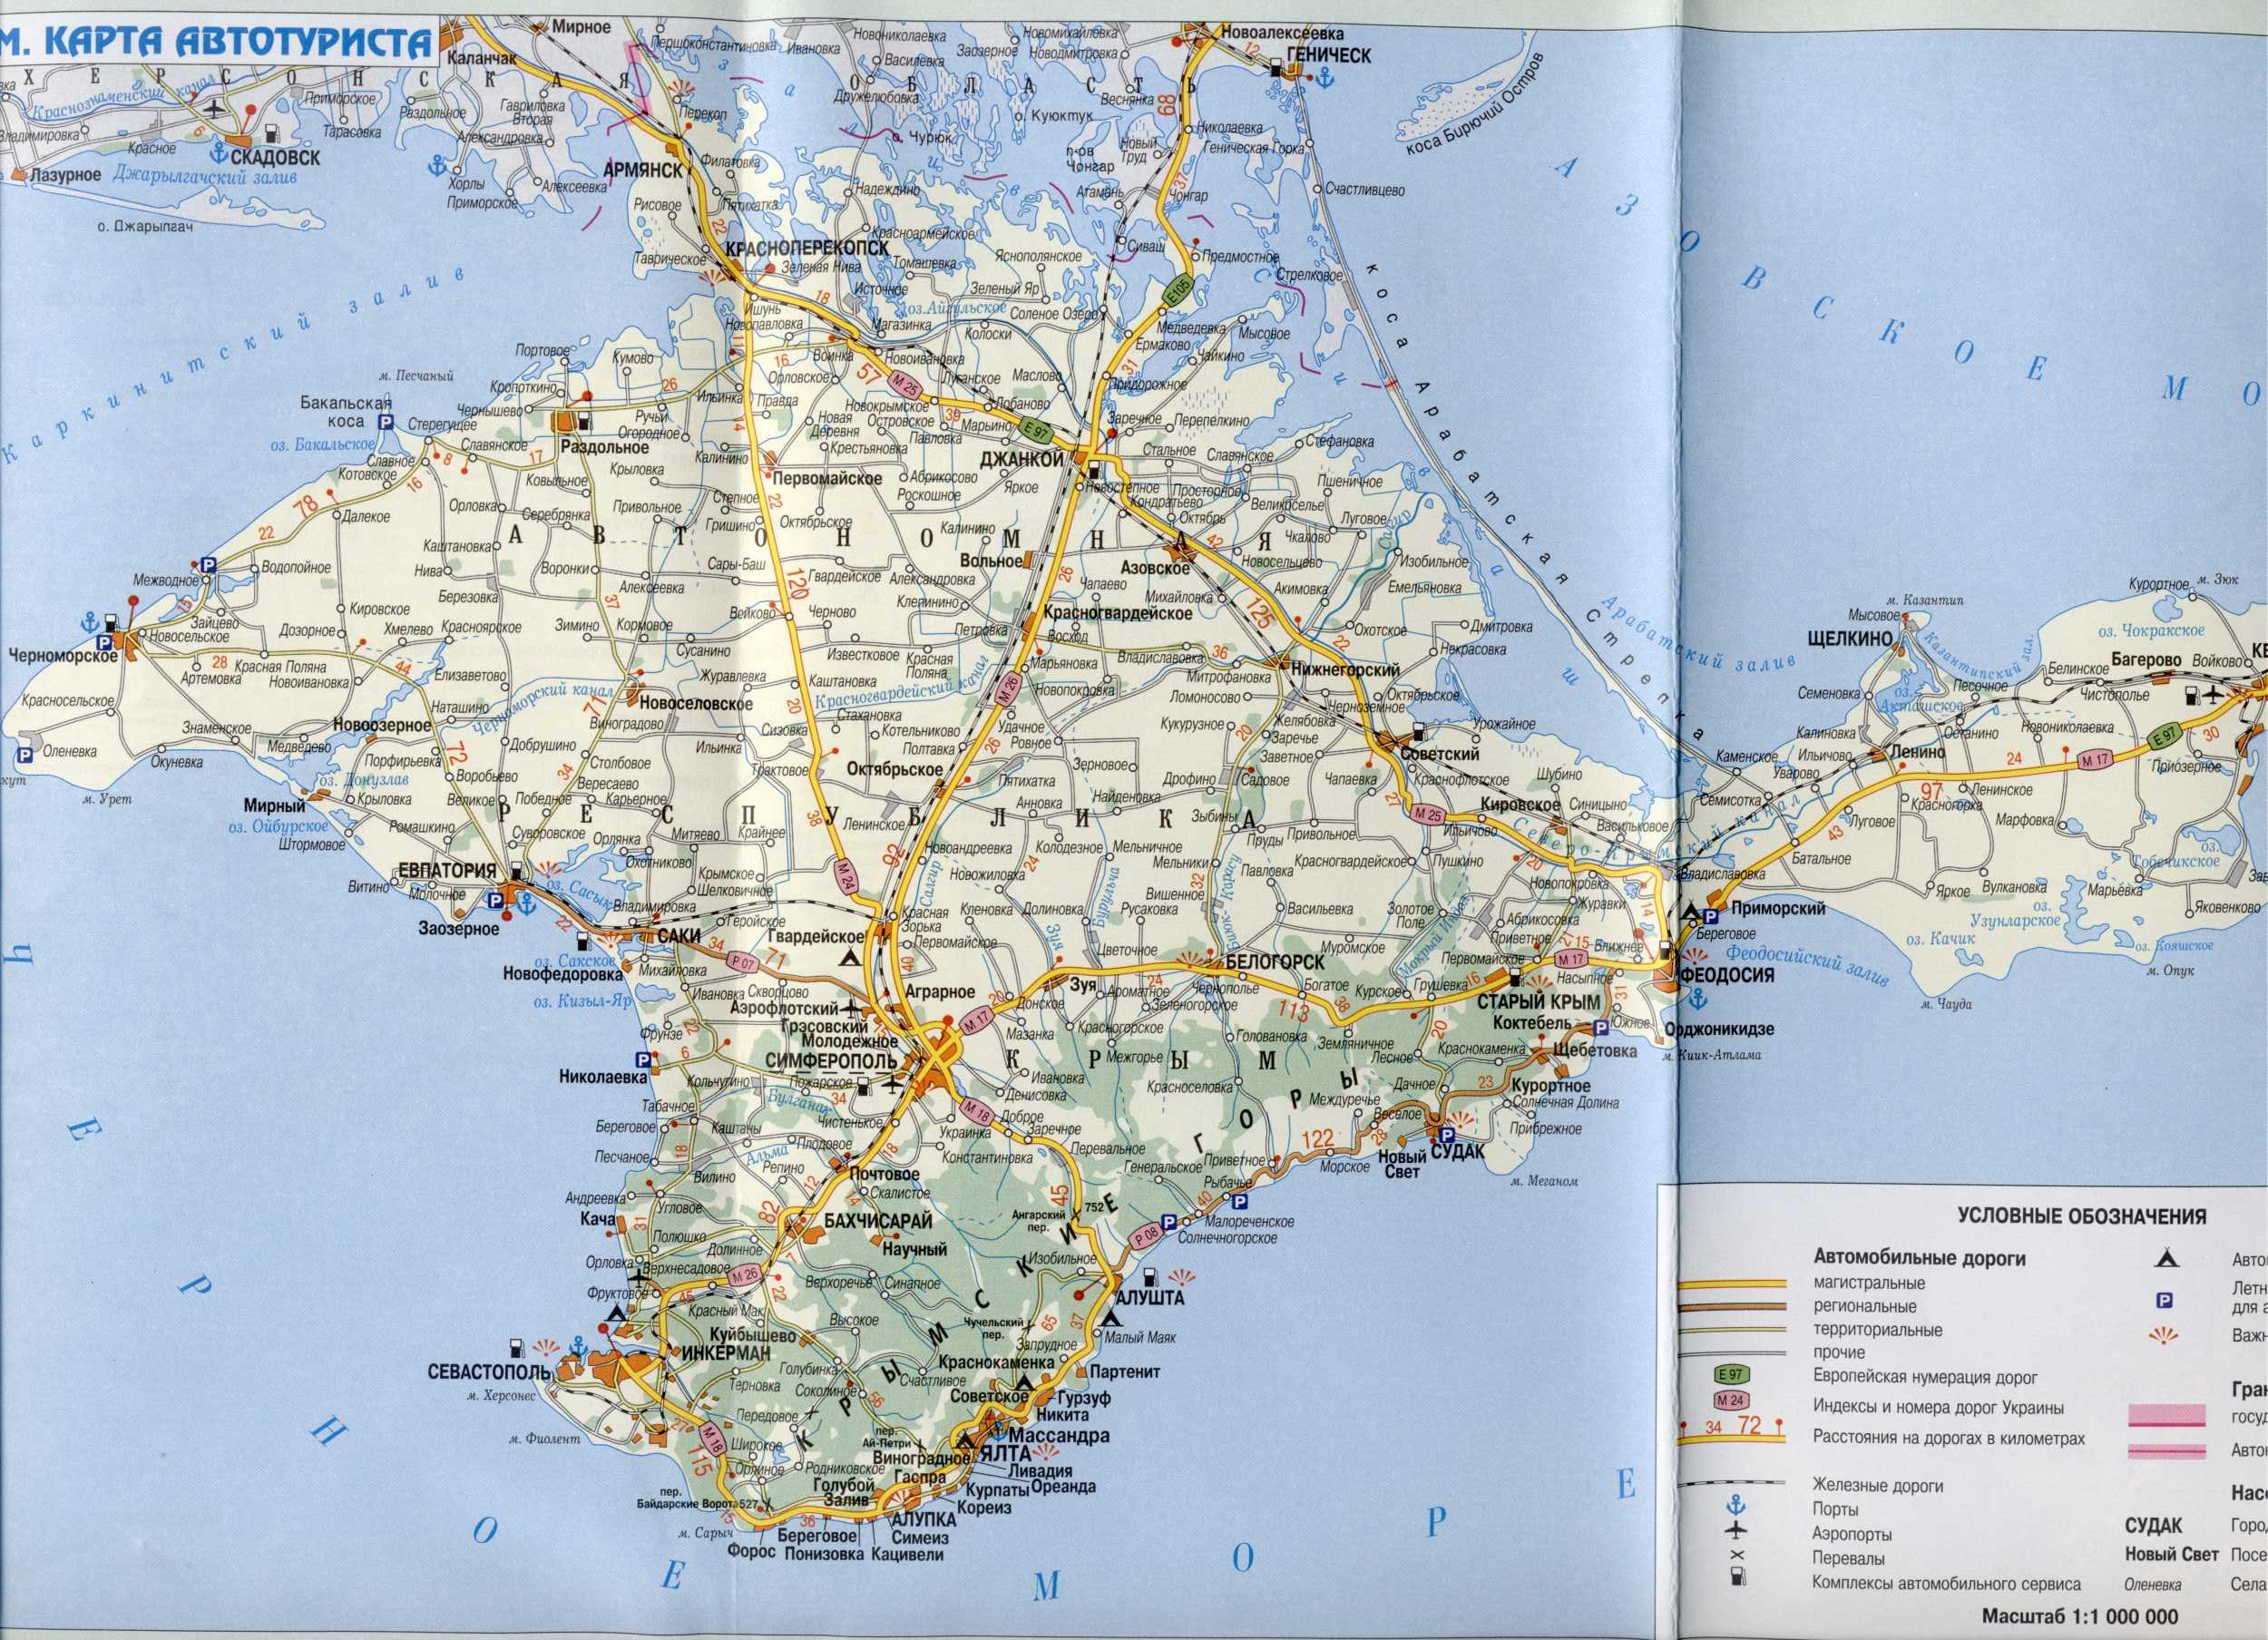 Карта Крыма: http://ocrim.ru/index.php?file=map_crimea